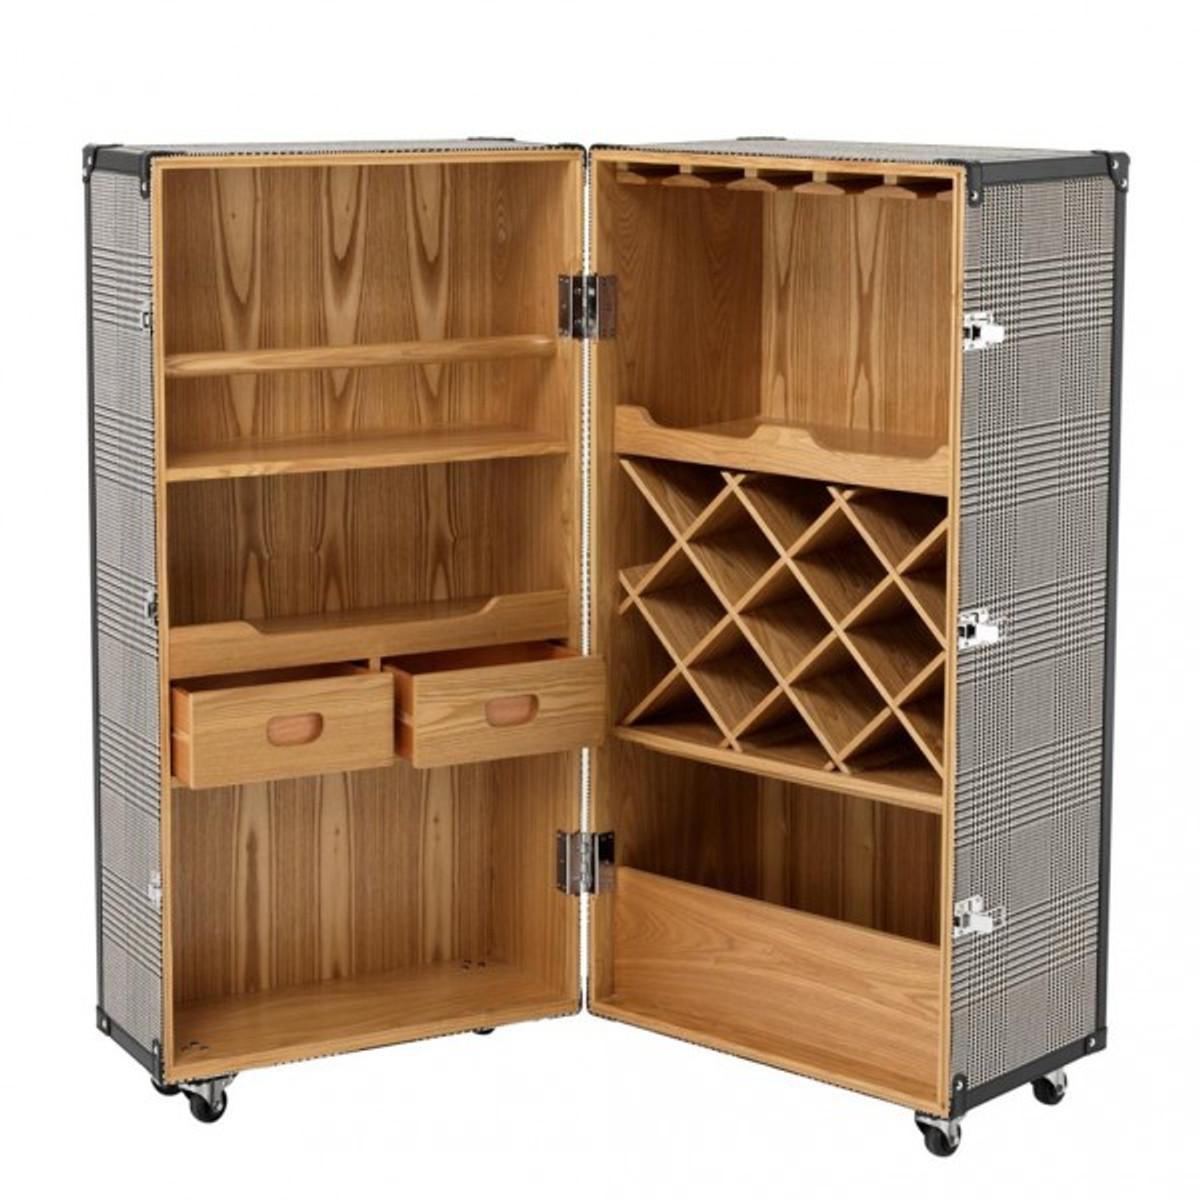 kommode koffer look schrank kommode xxcm shabbylook vintage braun with kommode koffer look. Black Bedroom Furniture Sets. Home Design Ideas